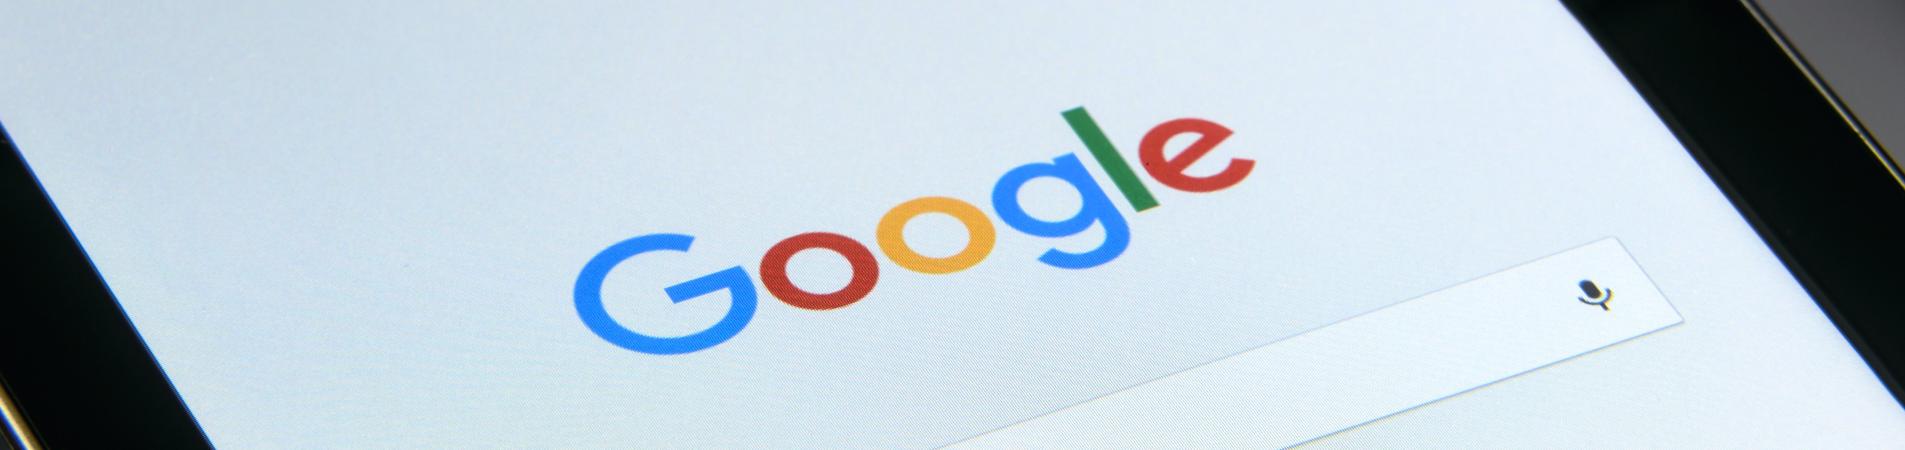 Preparing for Google's latest update